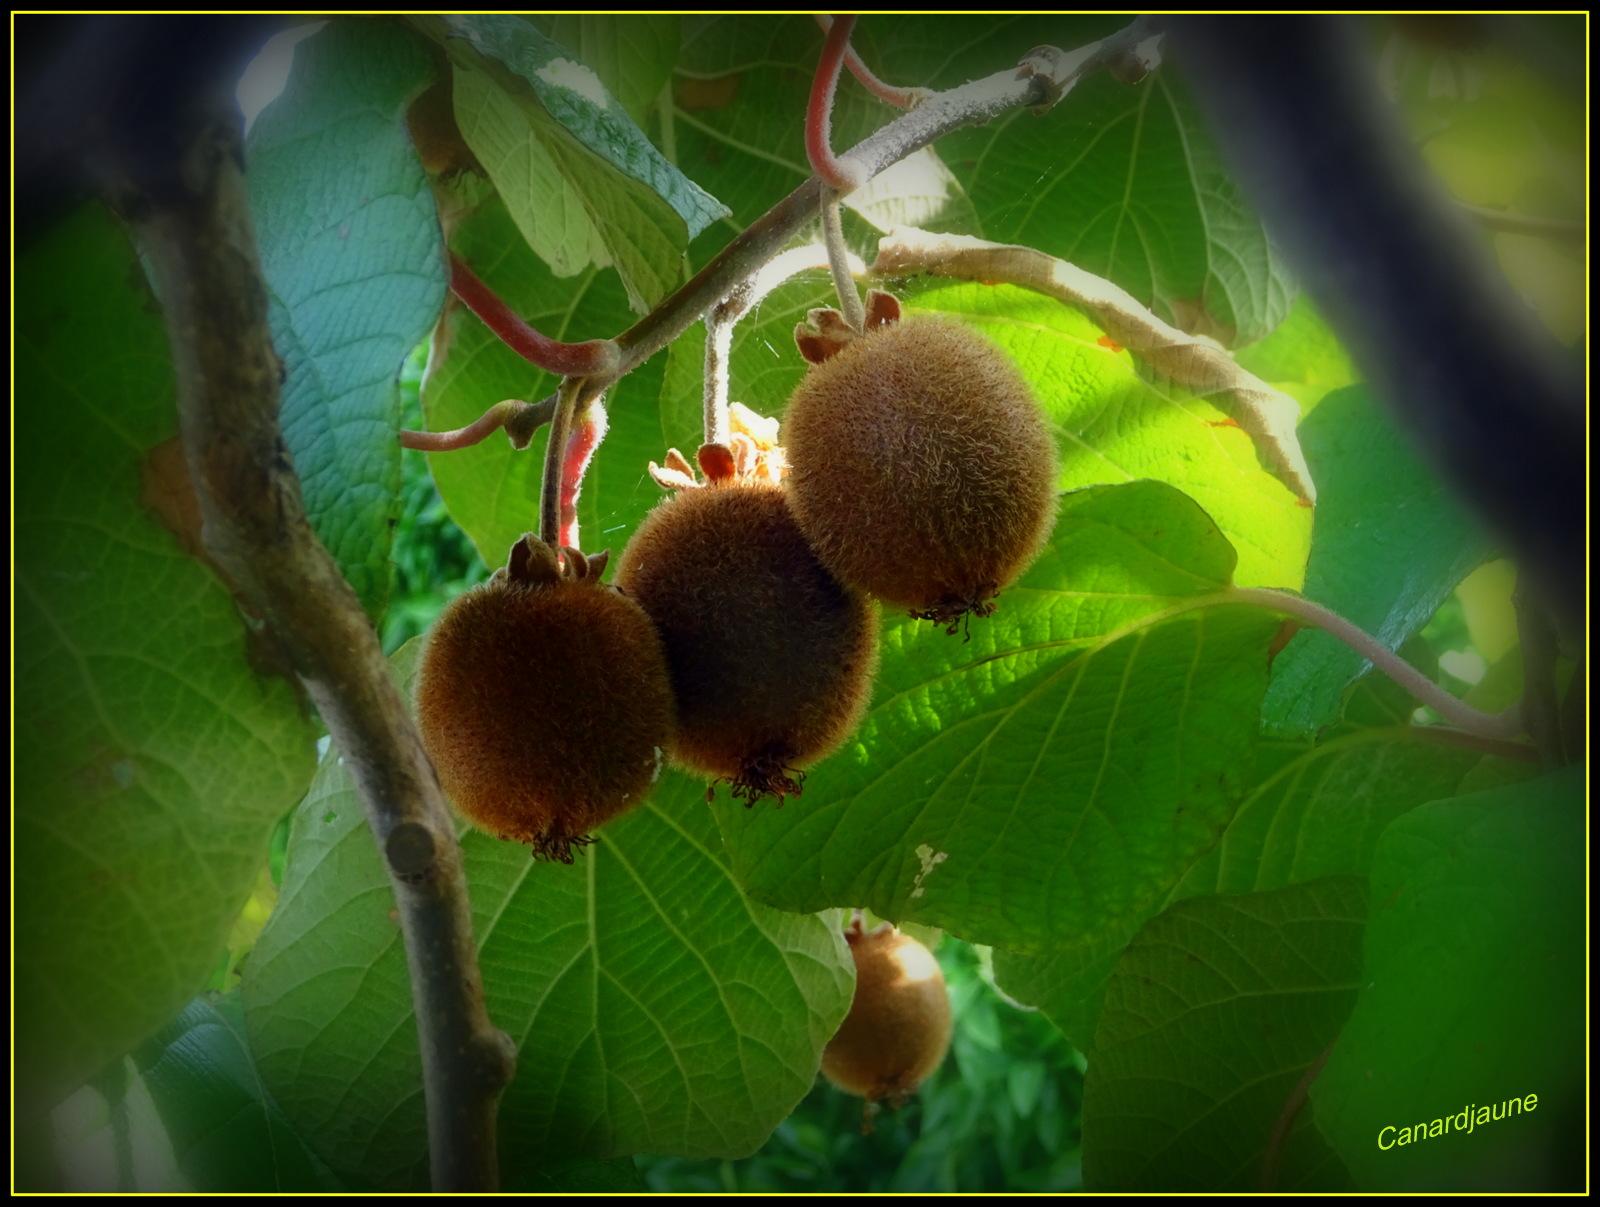 actinidia deliciosa, l'arbre à kiwi, groseille de chine,la souris